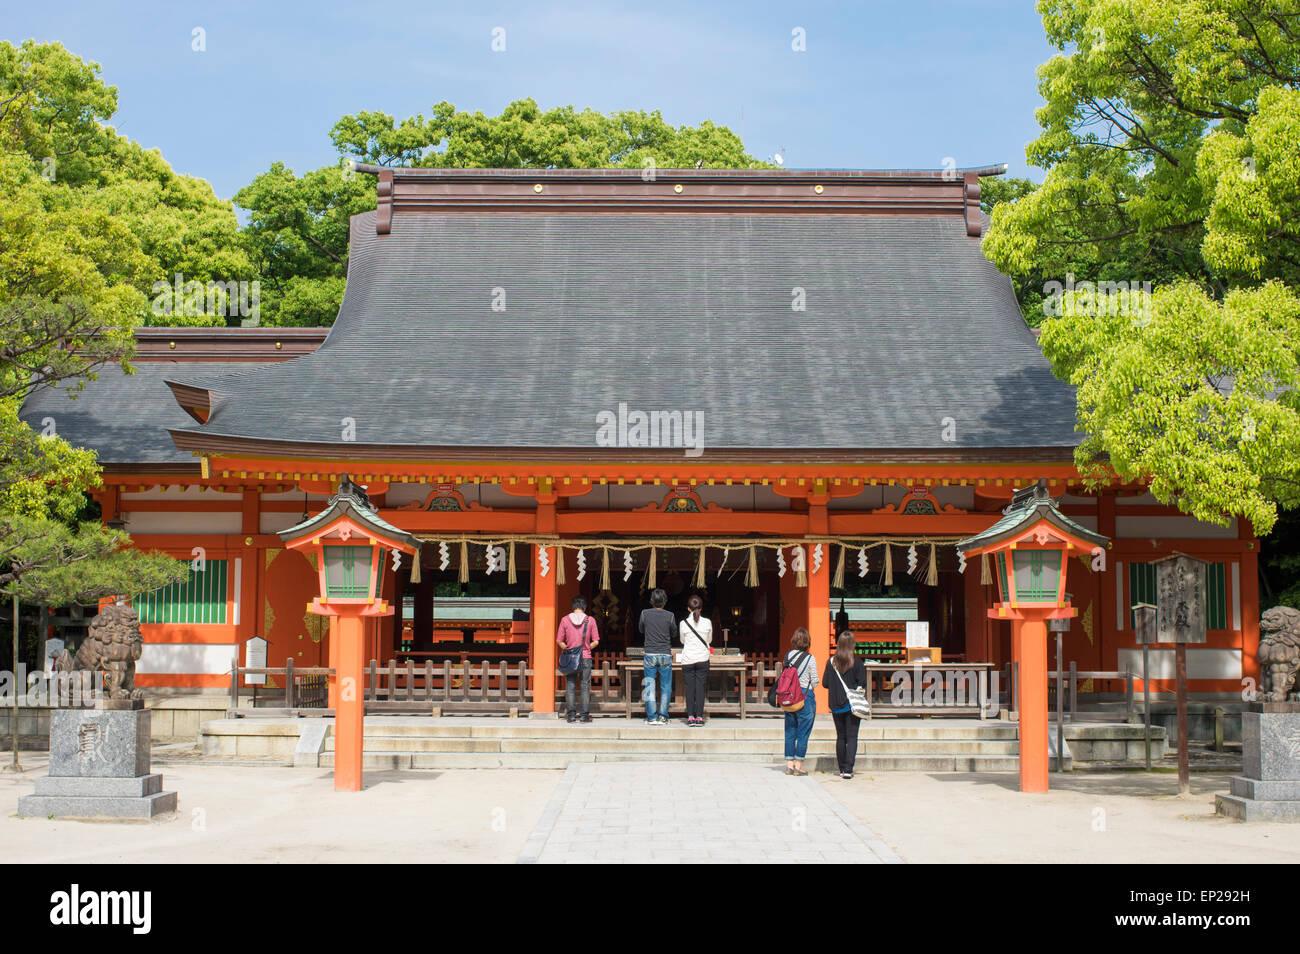 Sumiyoshi Shrine ( Shinto ) Fukuoka, Kyushu, Japan - Stock Image